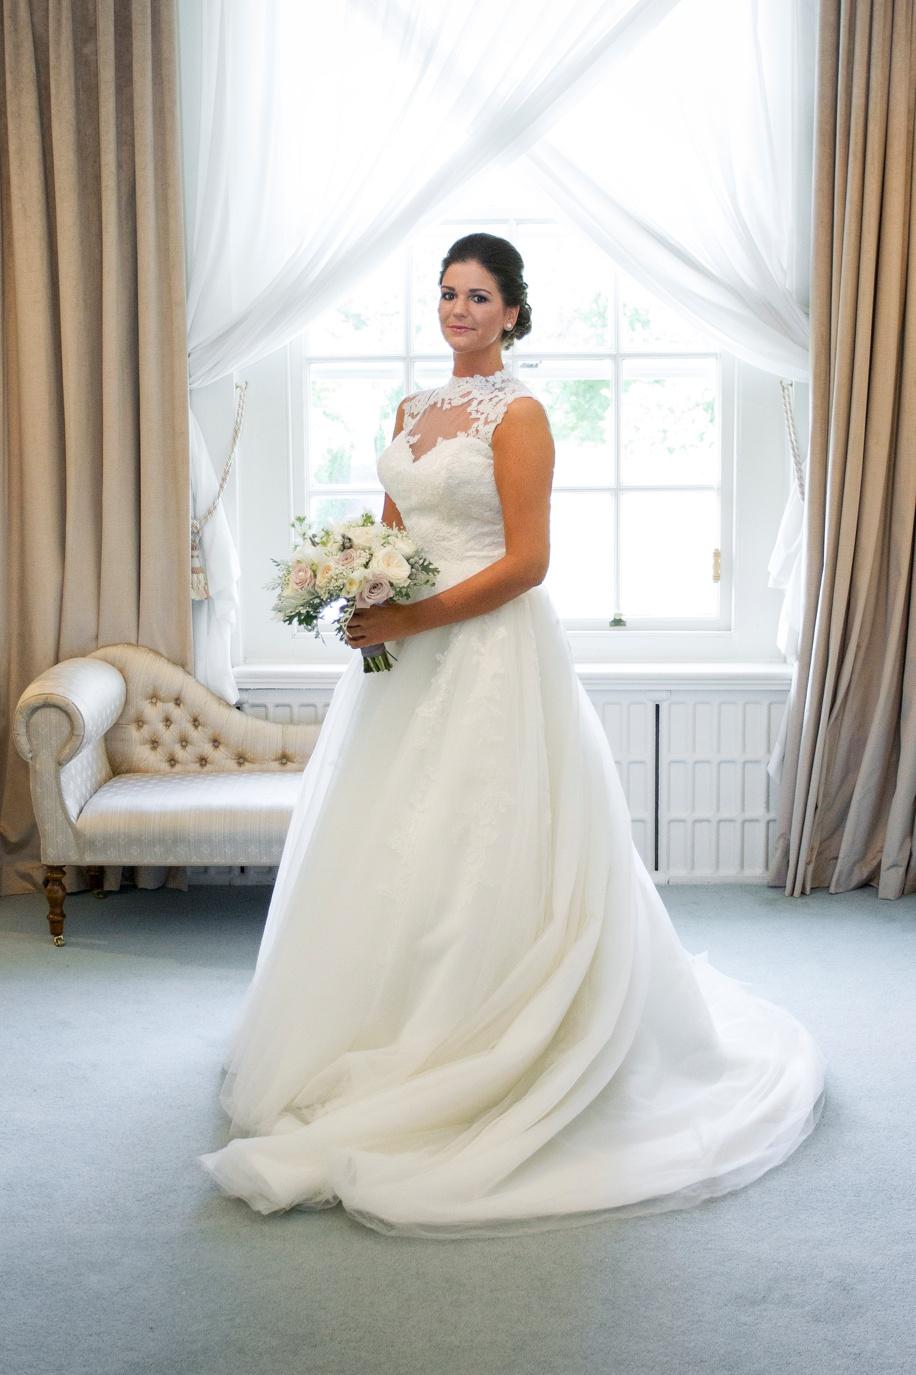 Beautiful Bride and wedding photographs at Northcote House